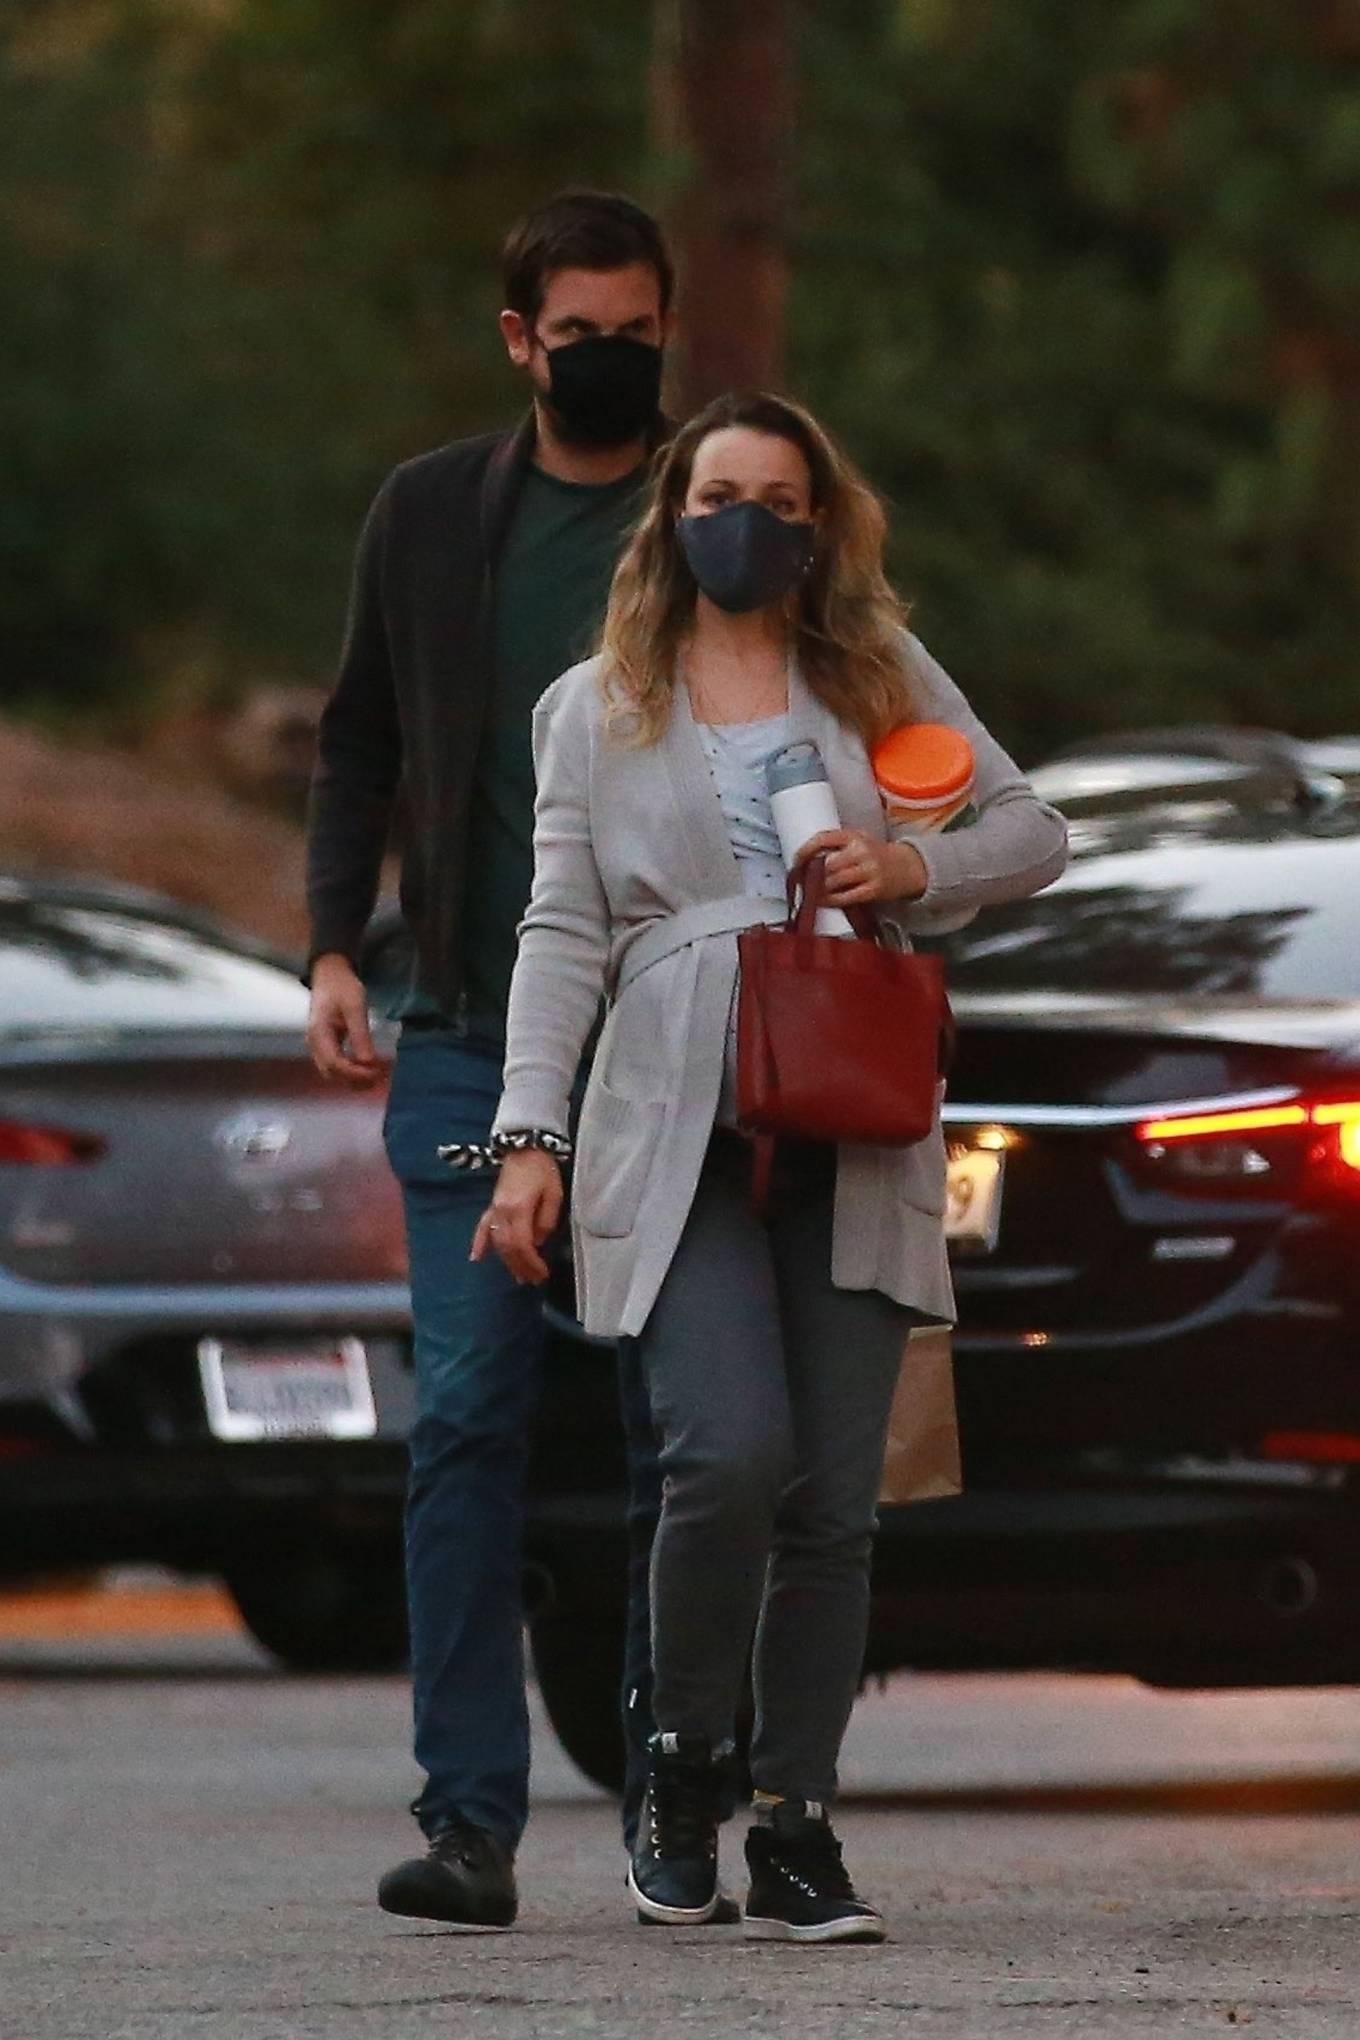 Rachel McAdams - Seen with her boyfriend at local park in Los Angeles